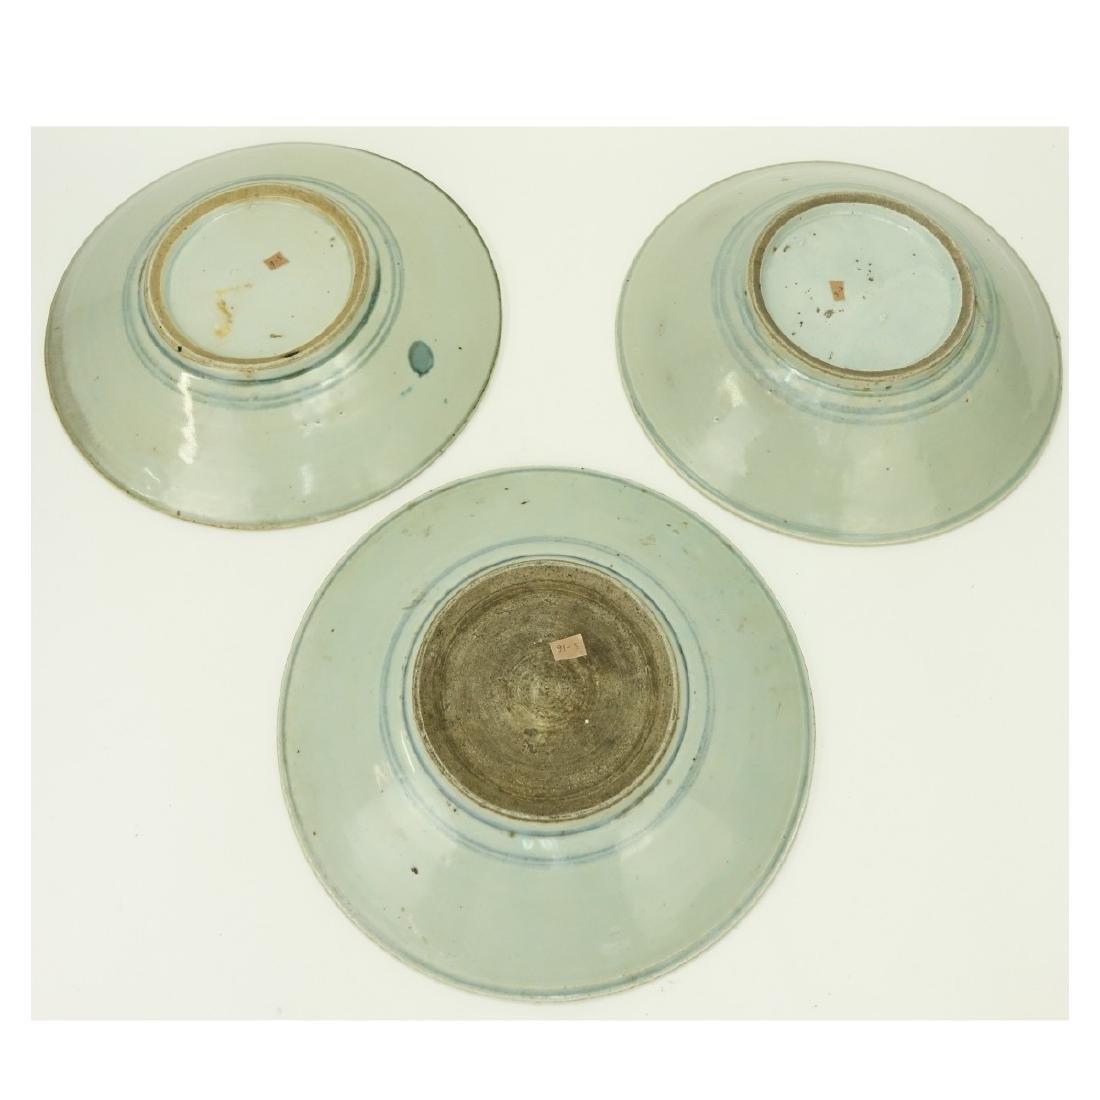 Three (3) Antique Chinese Ceramic Bowls - 4